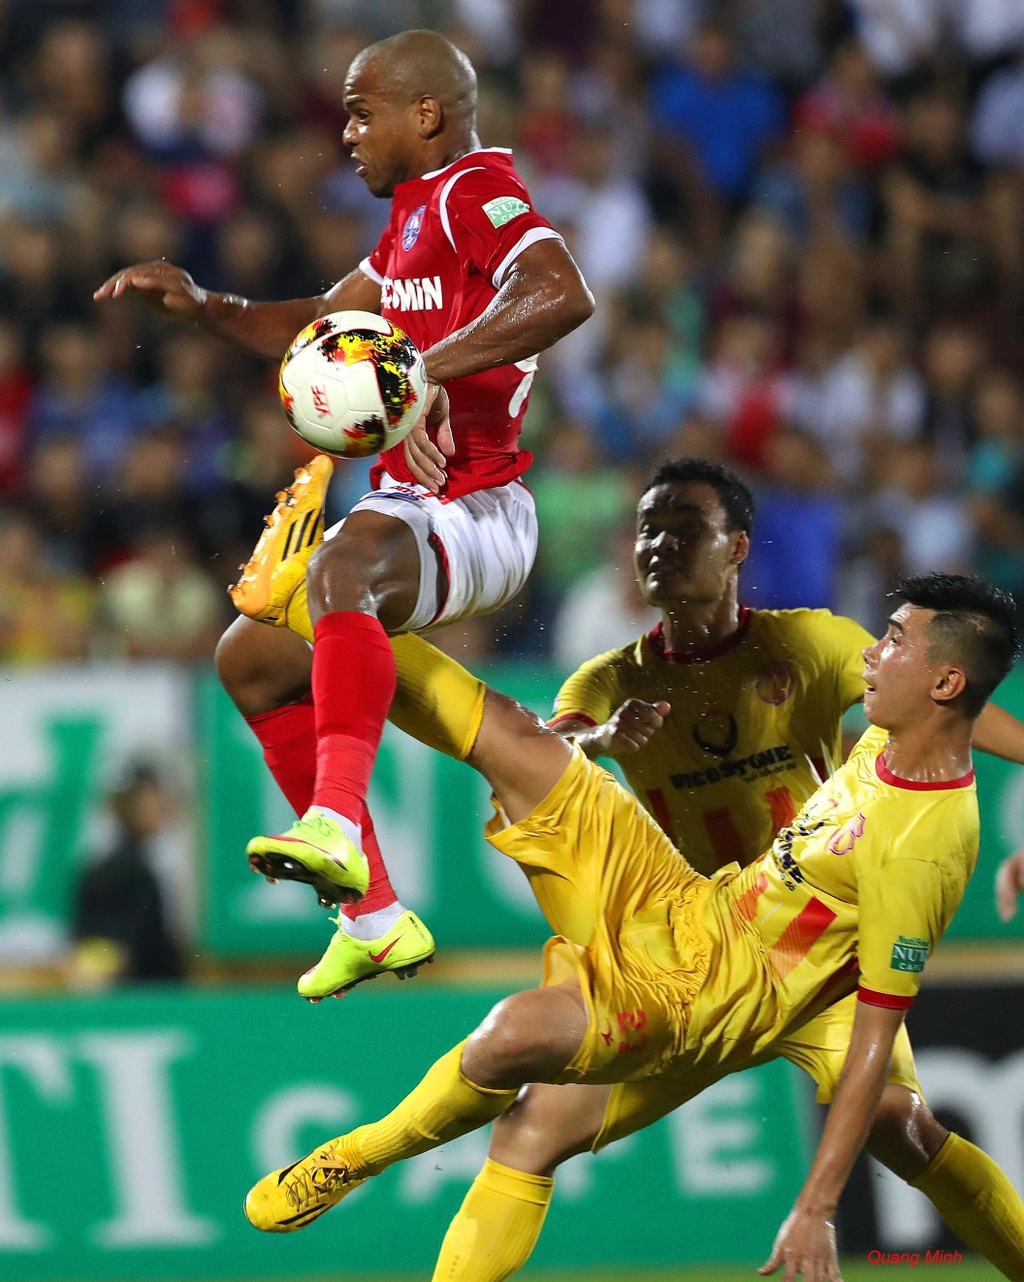 Nhung tac pham anh cua giam khao 'Song cung World Cup' Quang Minh hinh anh 6